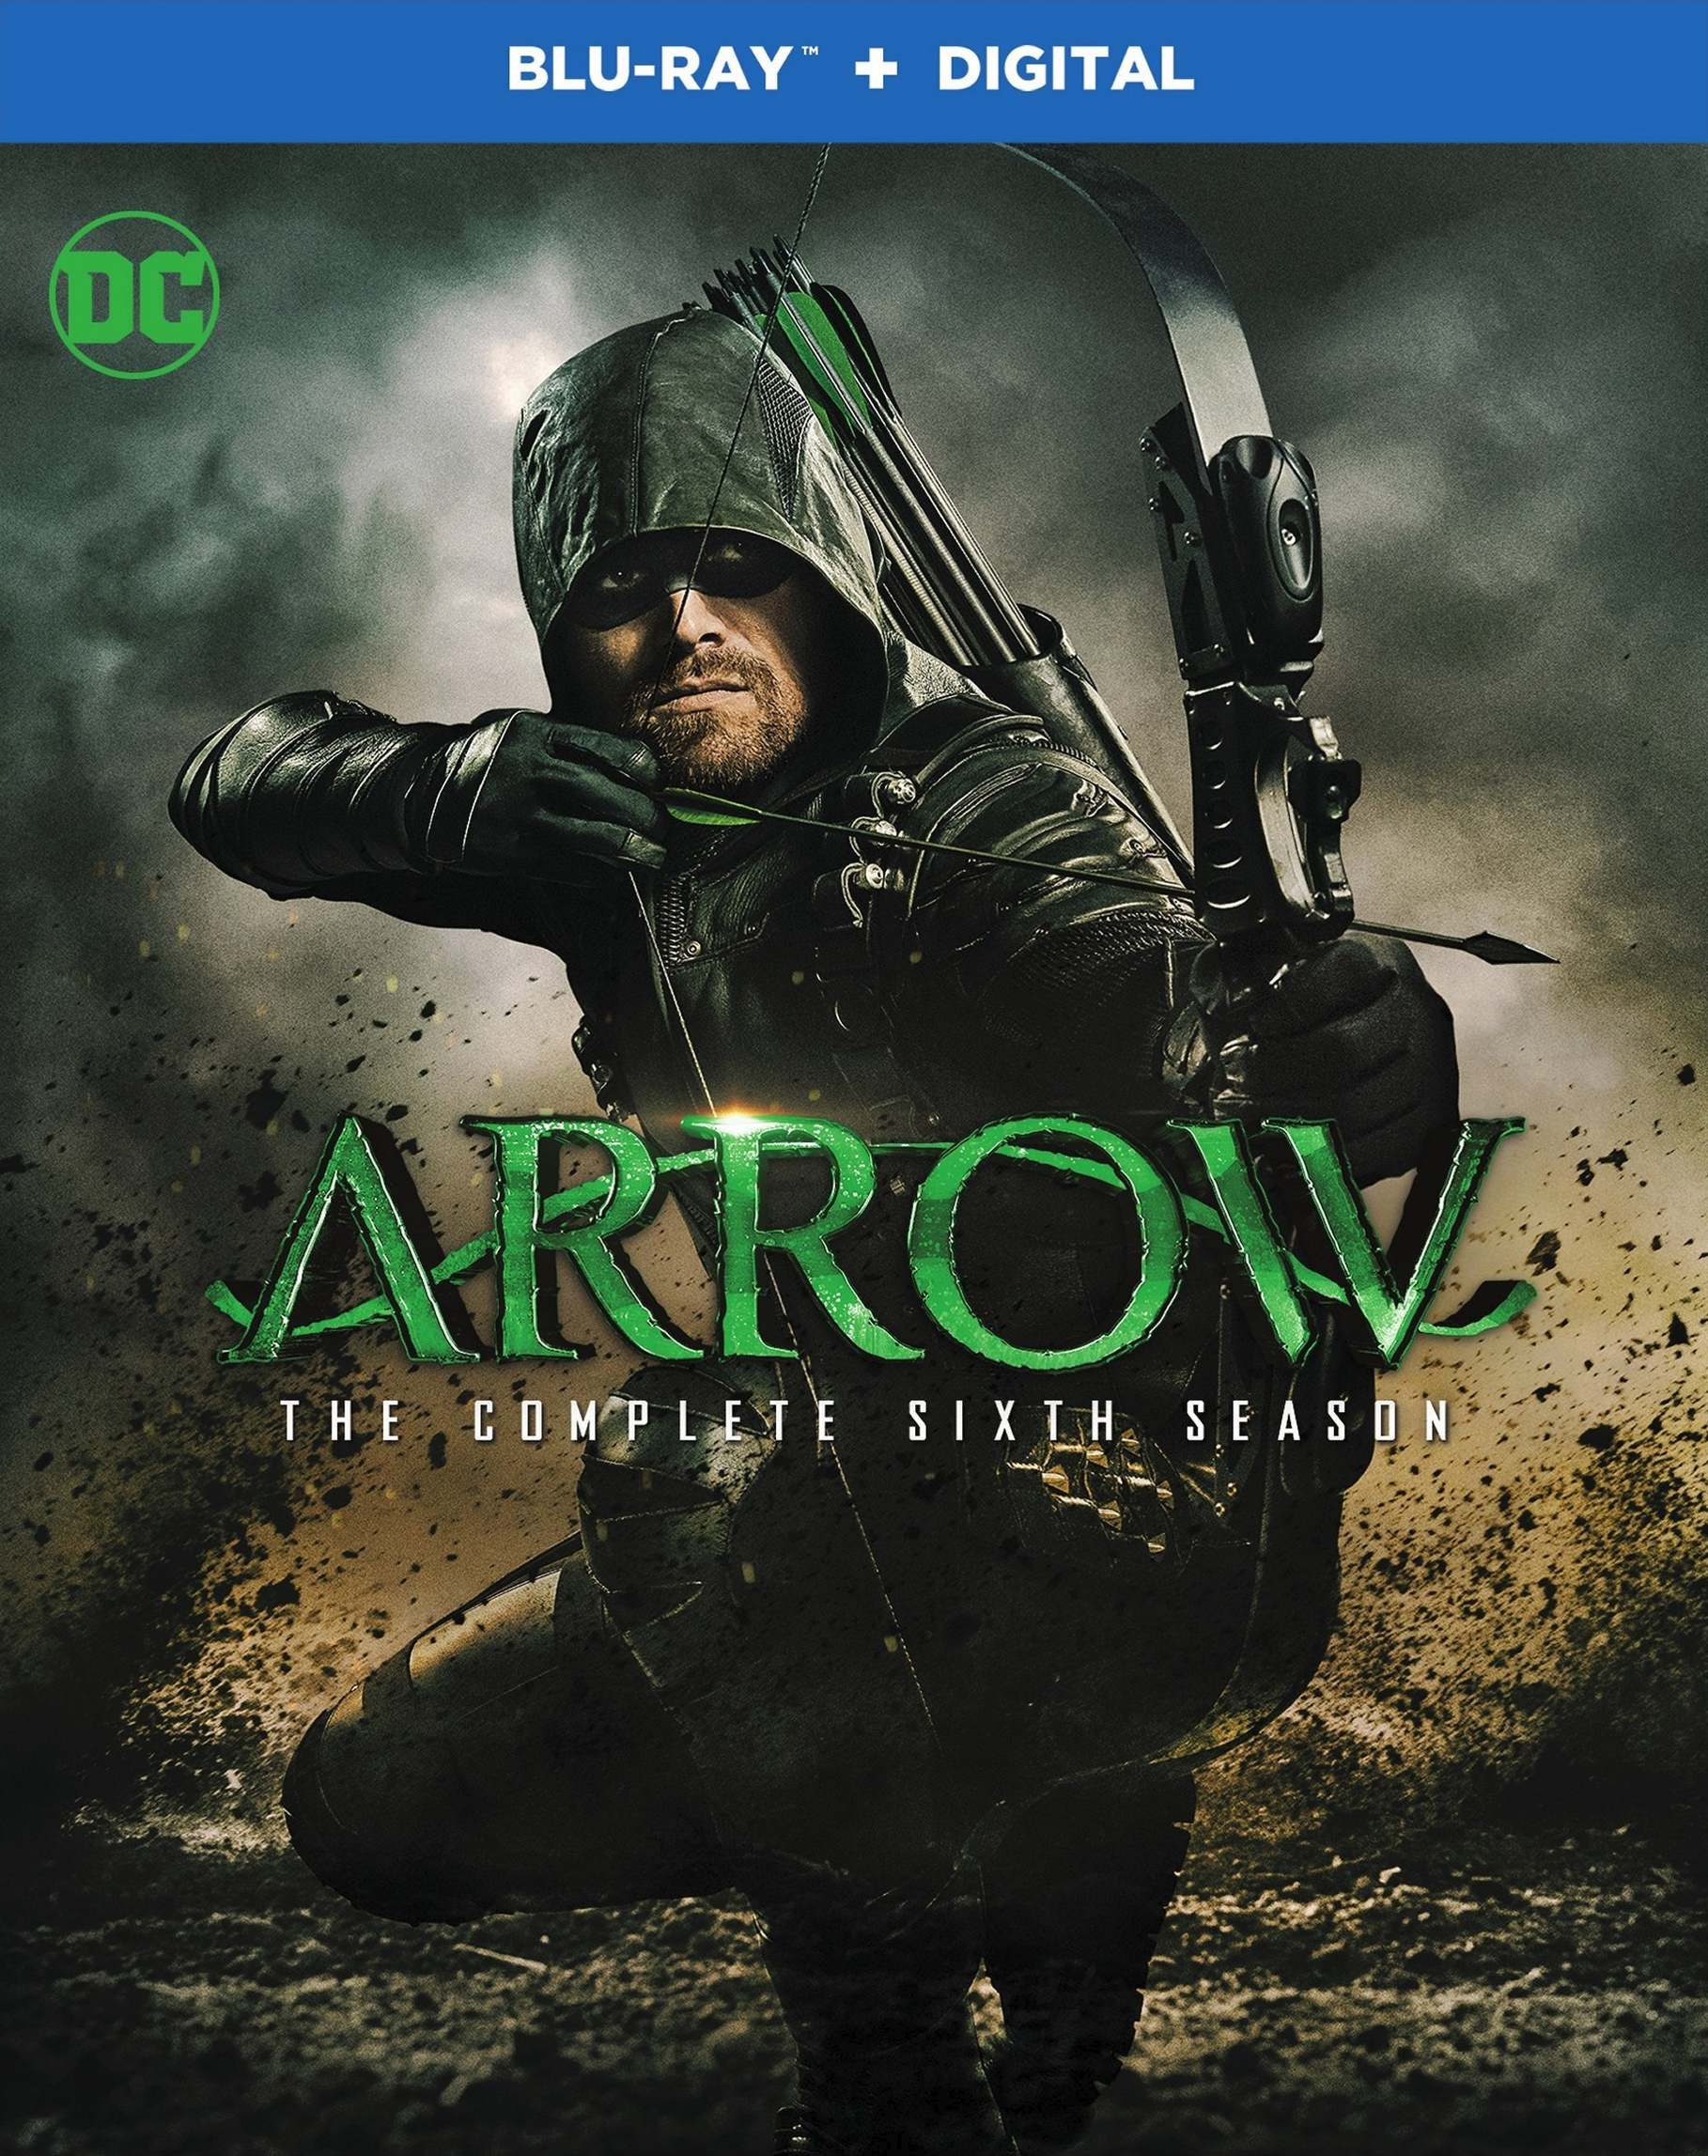 Arrow: The Complete Sixth Season (TV) (2017) Blu-ray